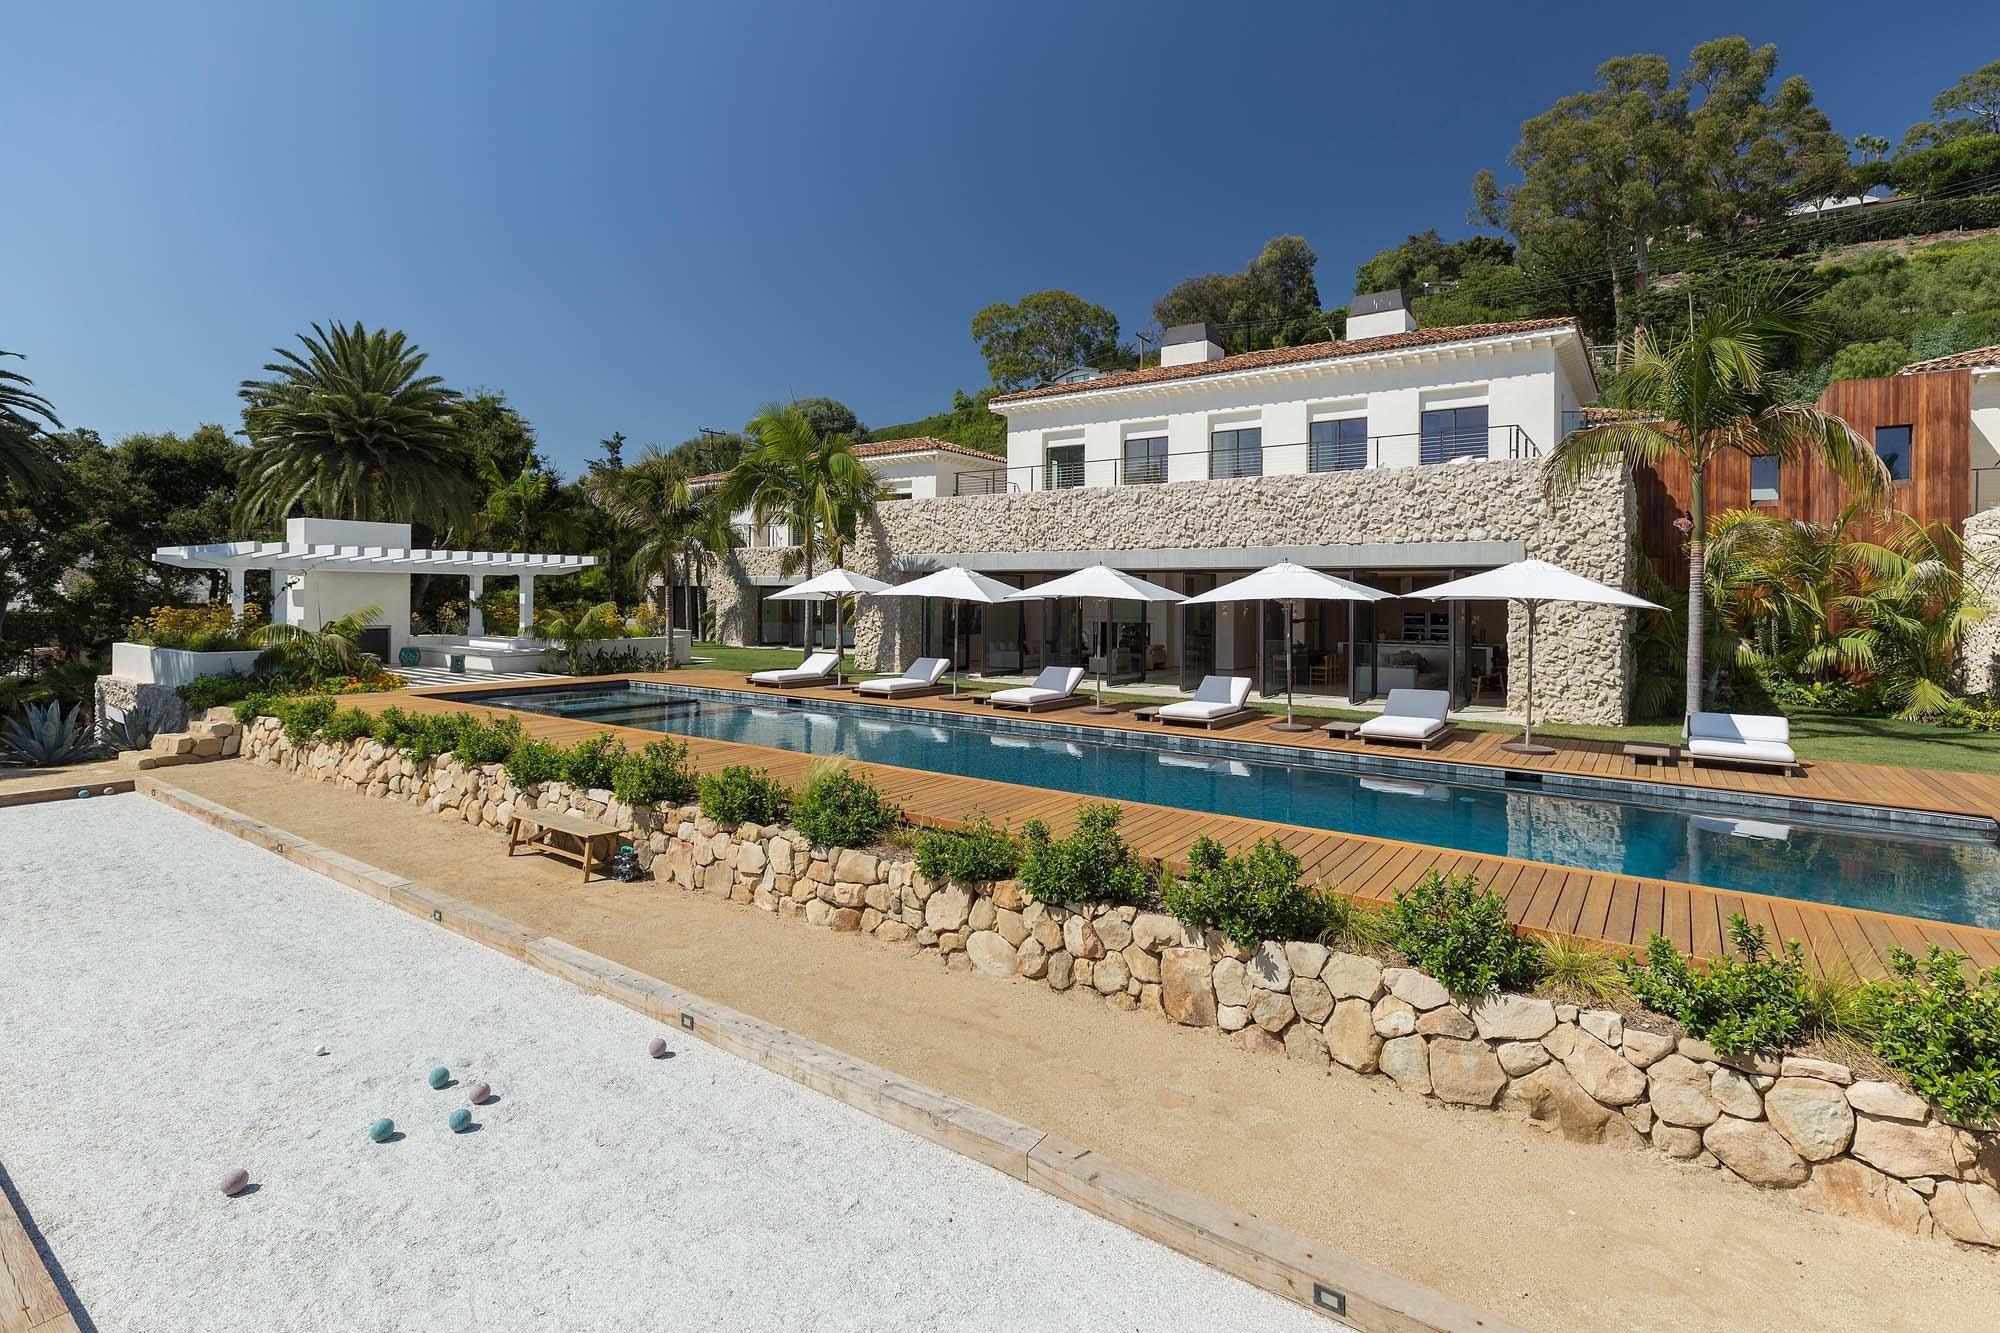 Single Family Home for Sale at 4160 La Ladera Rd 4160 La Ladera Rd Santa Barbara, California,93110 United States